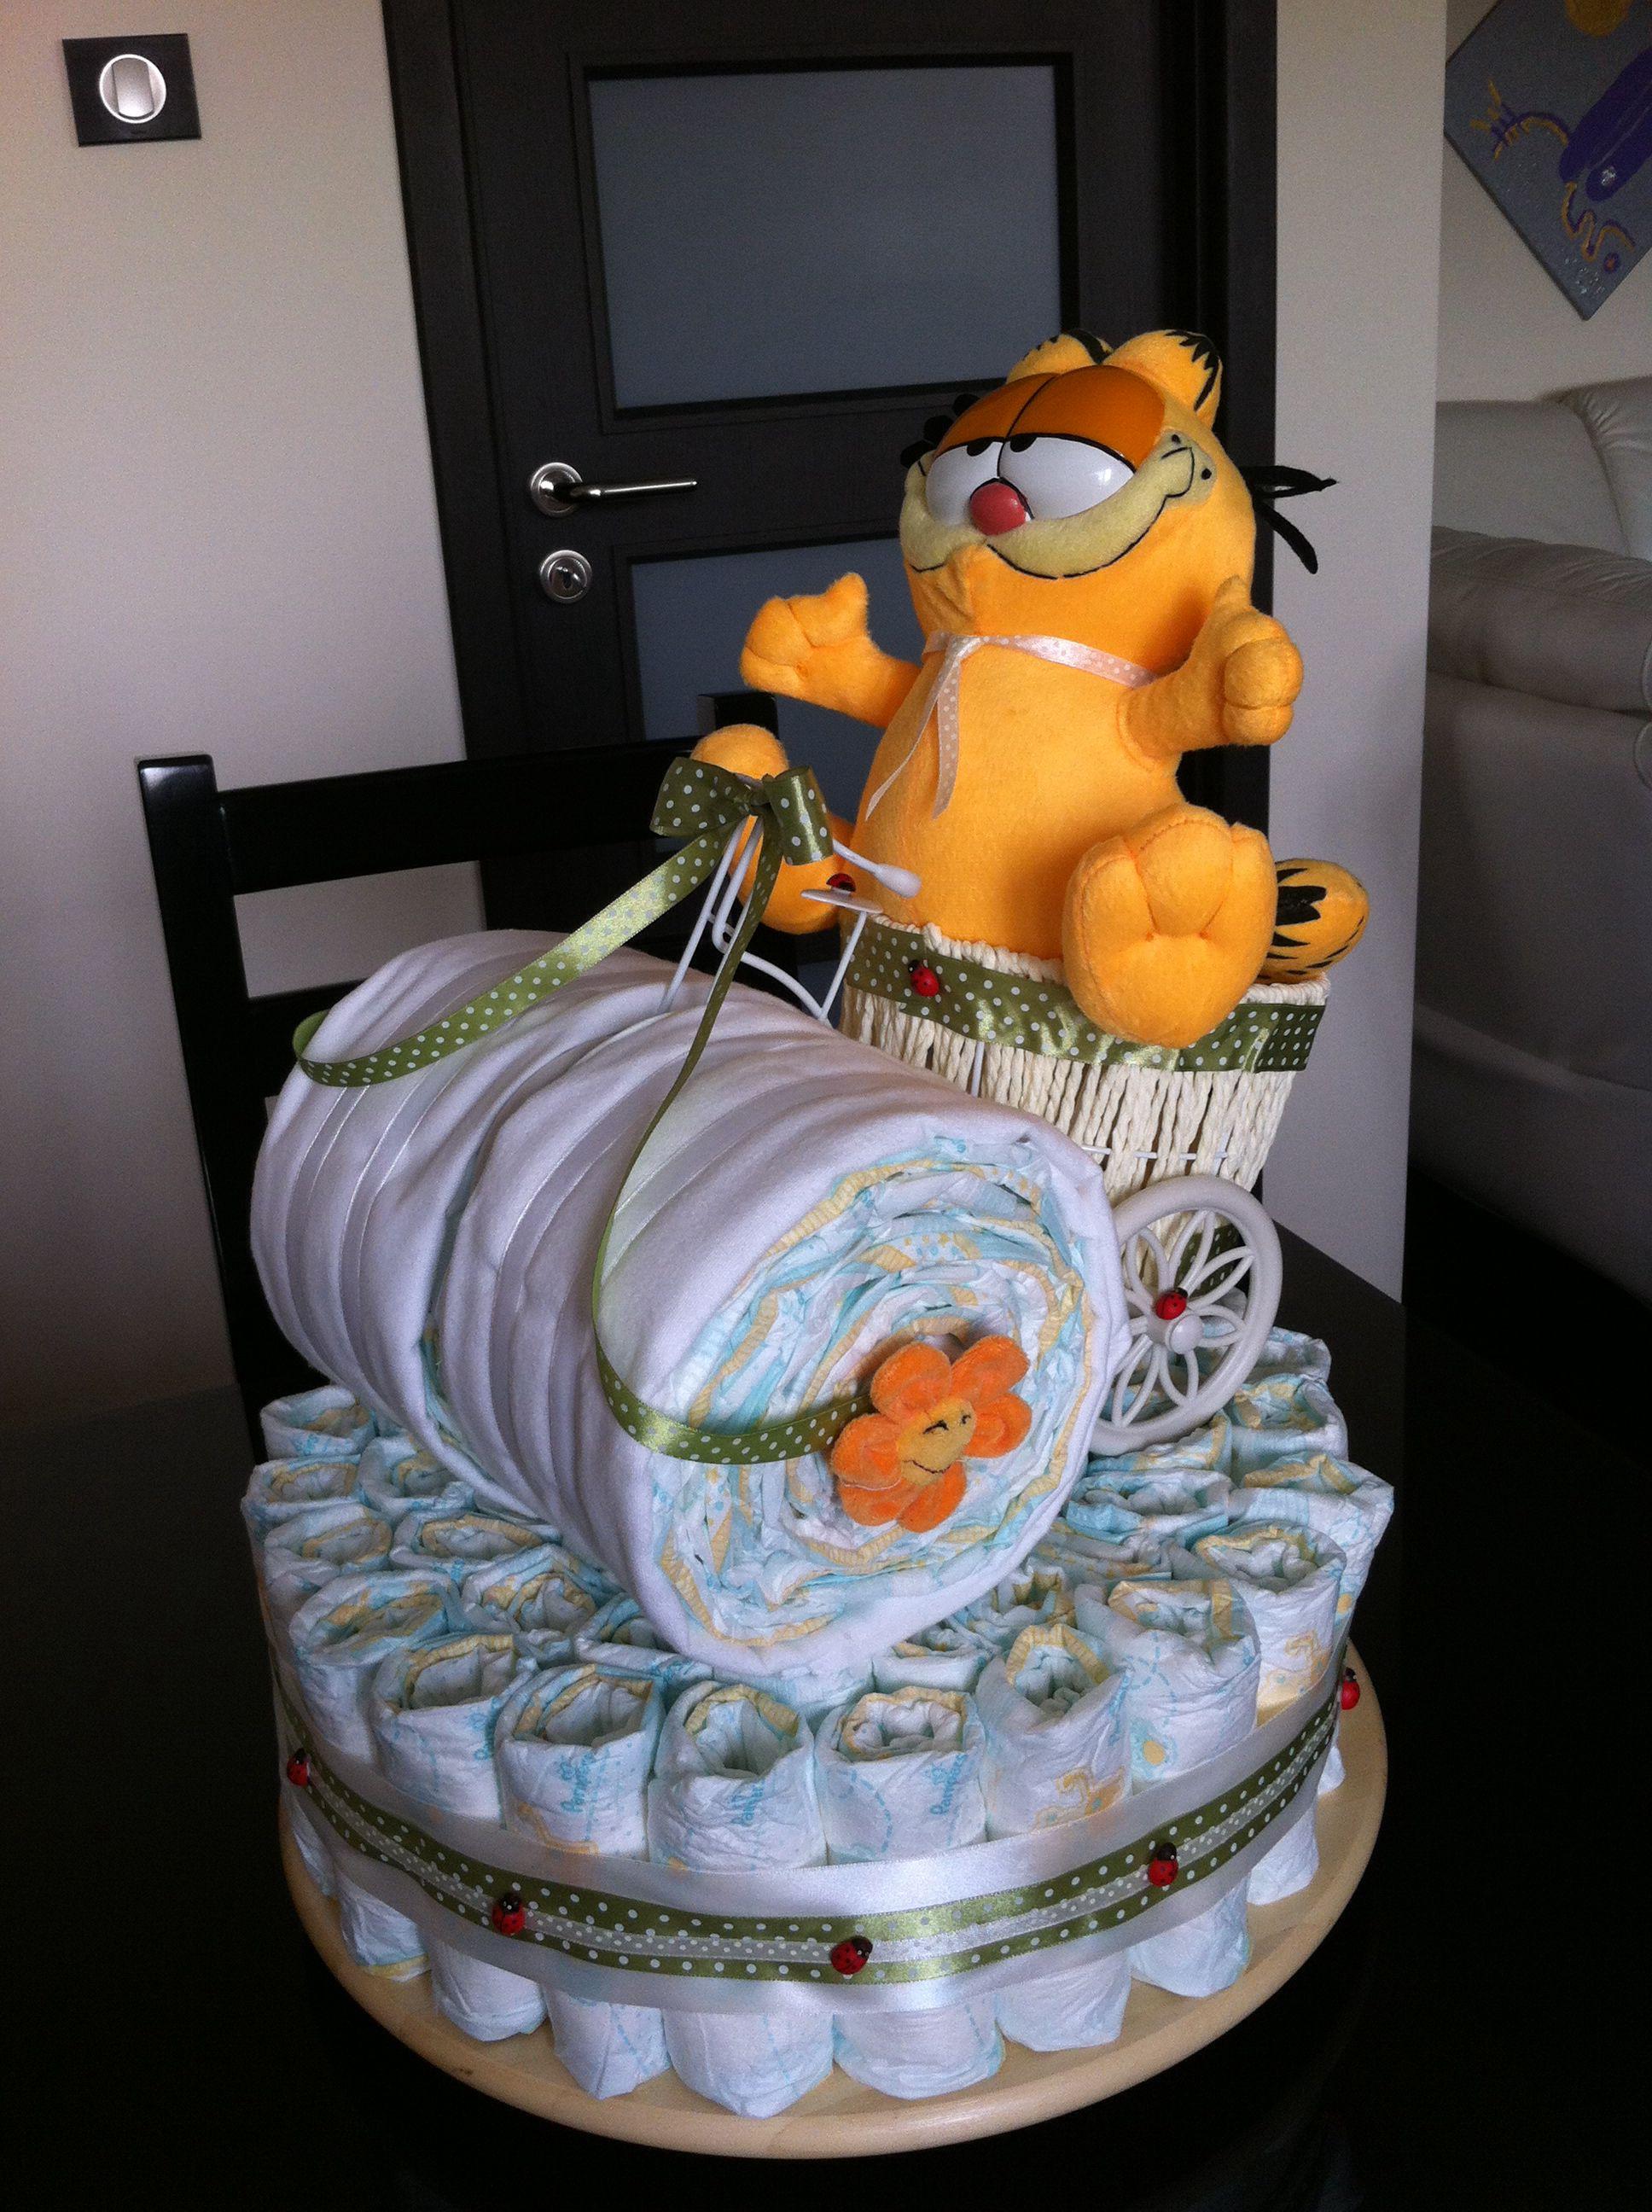 15 Adorable Baby Shark Birthday Cake Ideas (Theyre So